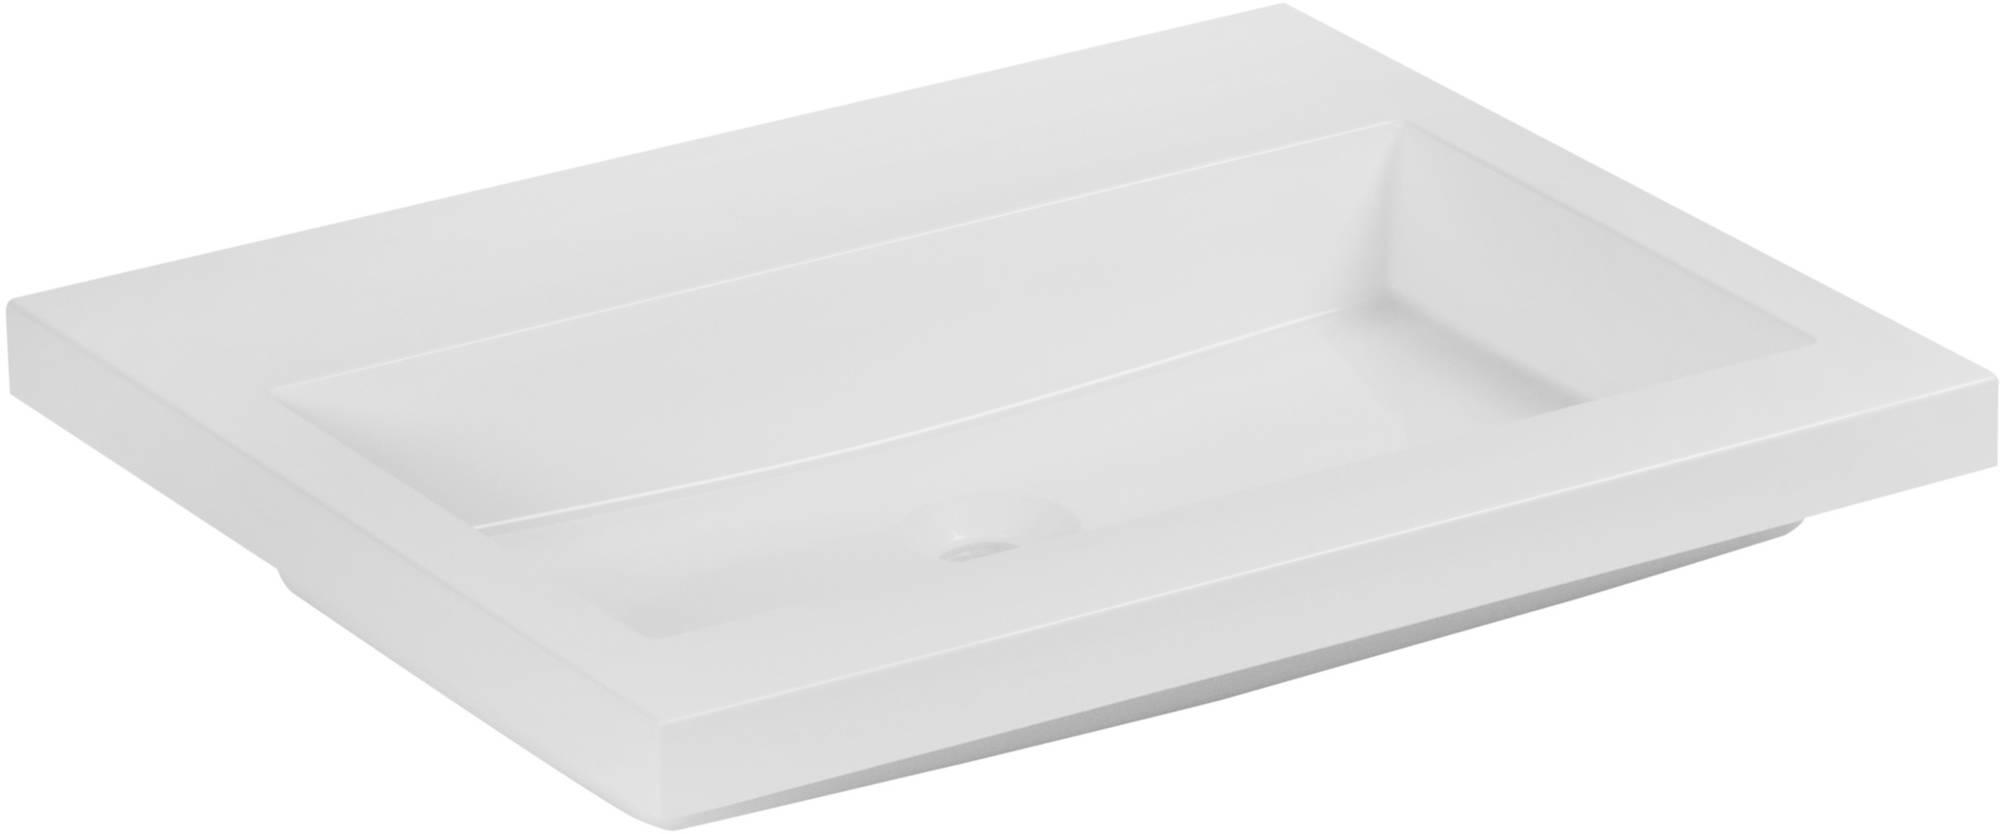 Ben Straight Wastafel zonder kraangat 60,5x51,5x4 cm Wit